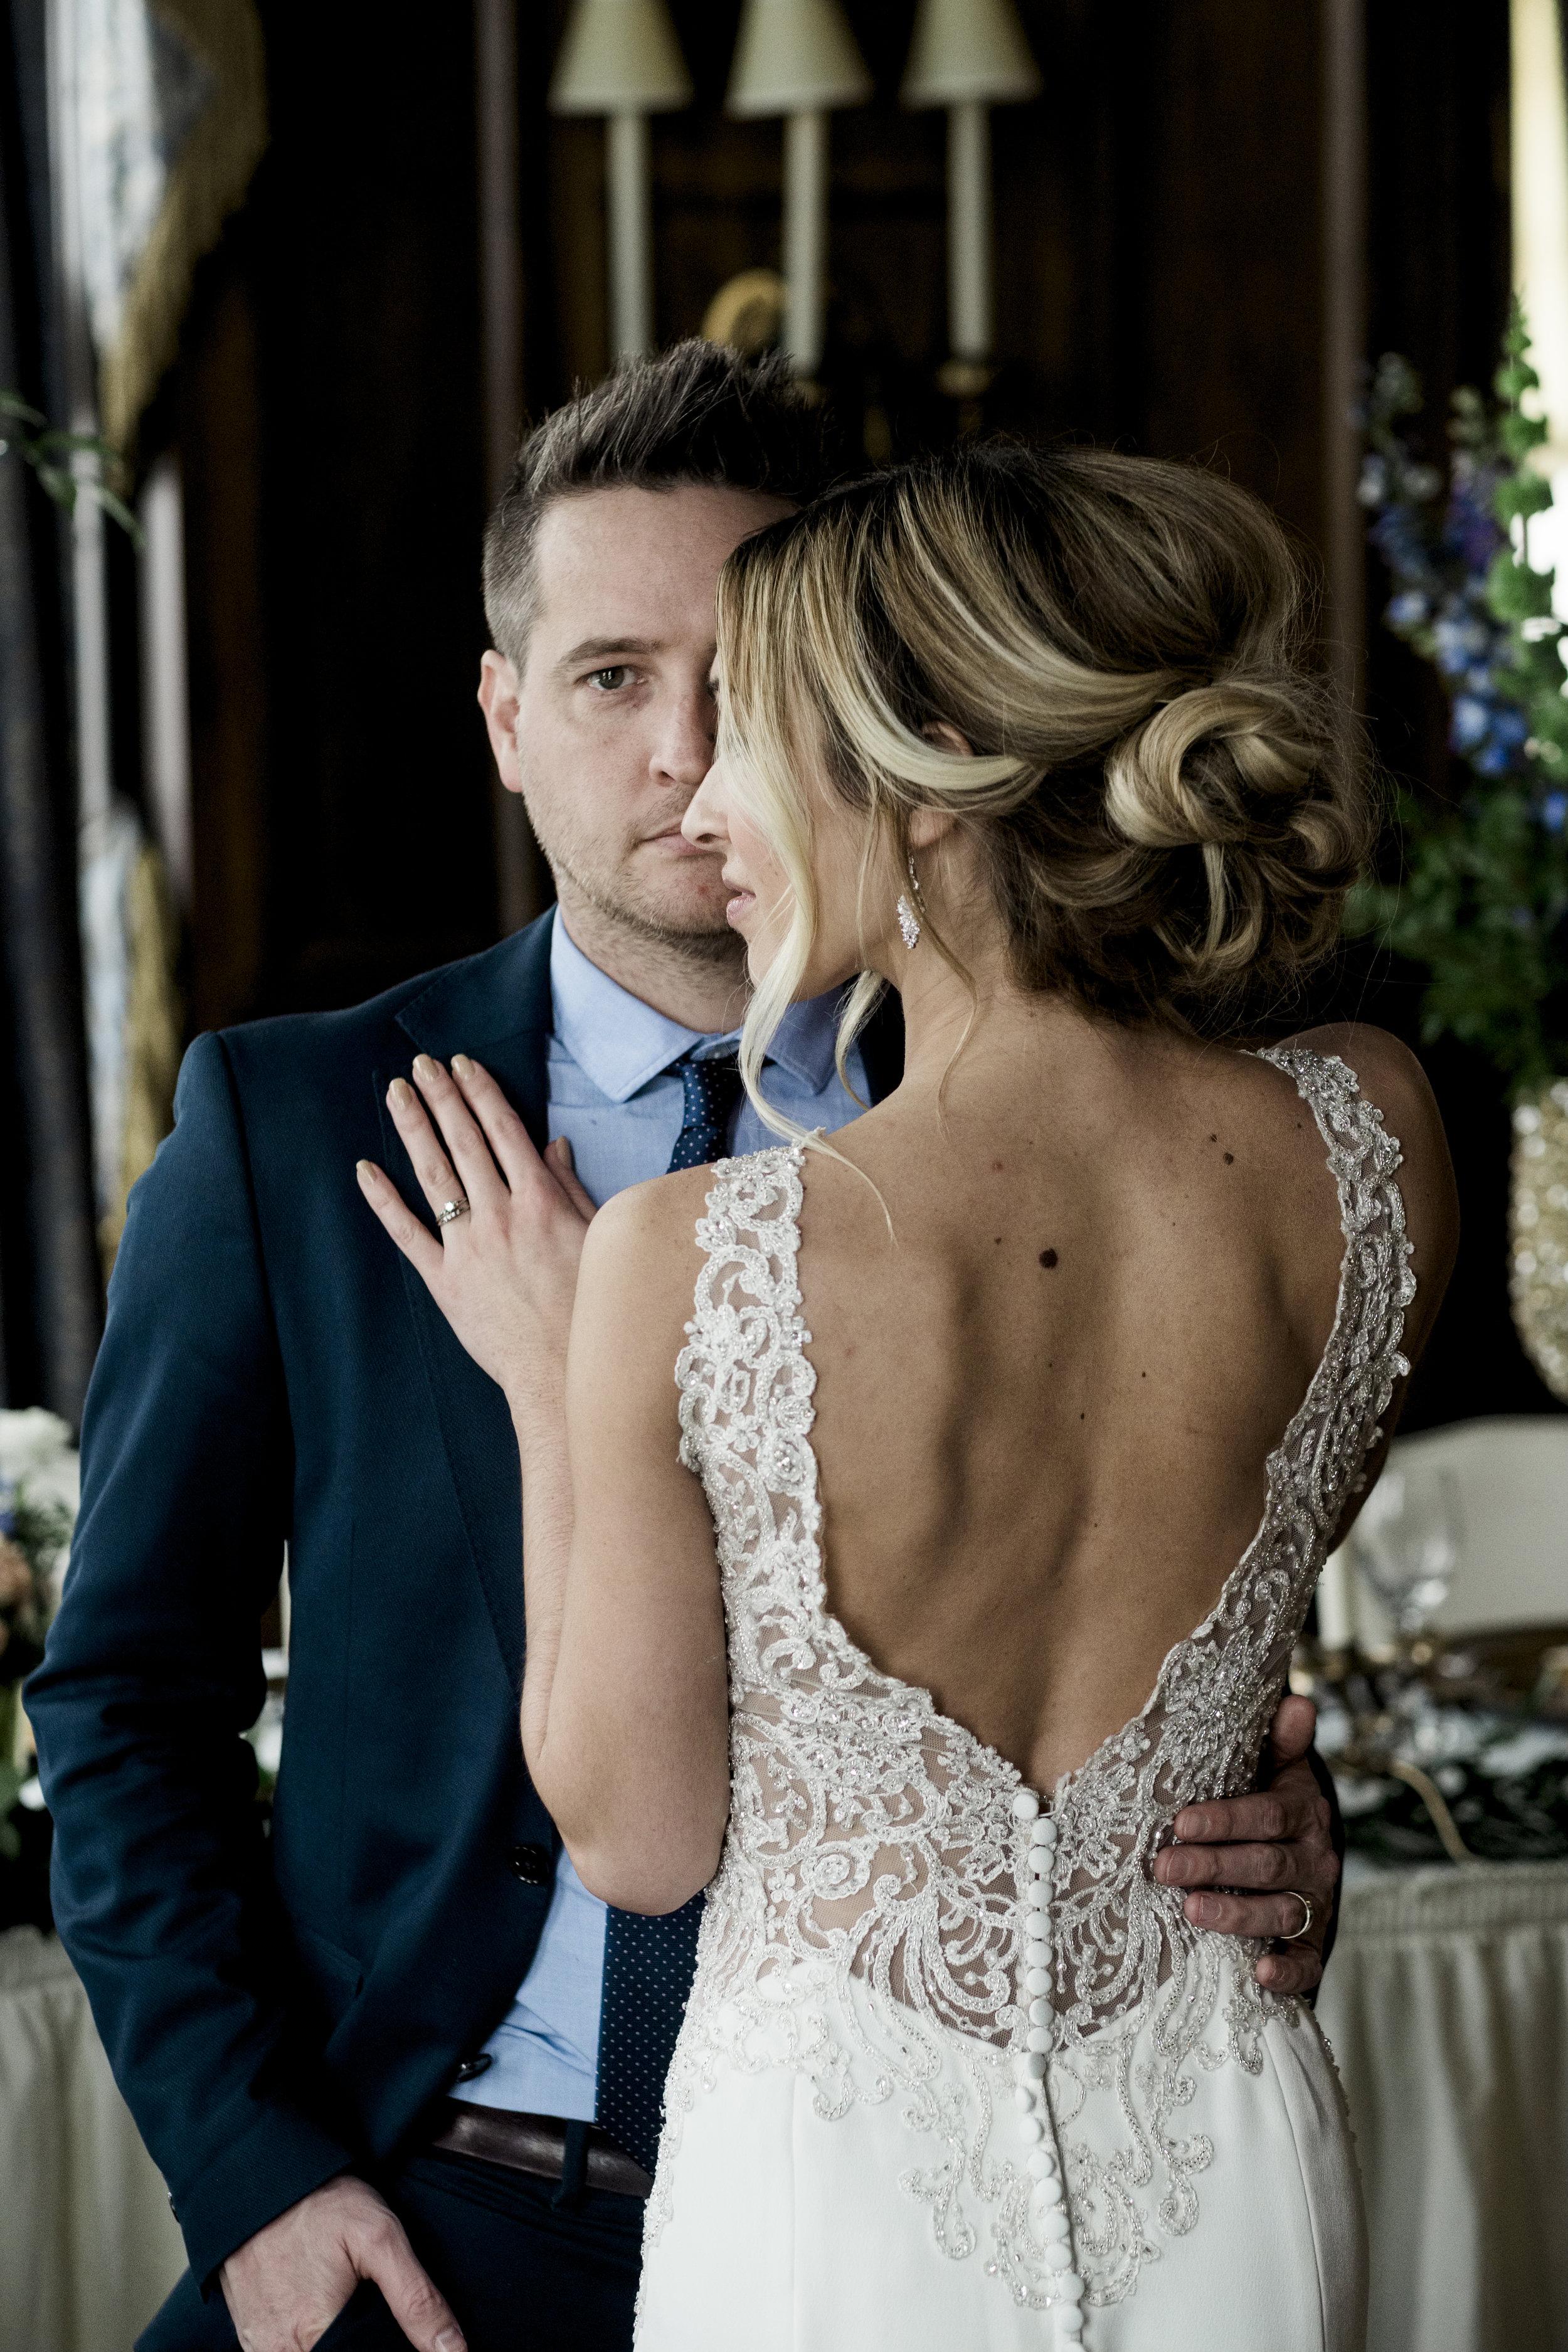 The Toledo Club Hosts Toledo Wedding Photographers for Styled Wedding Shoot